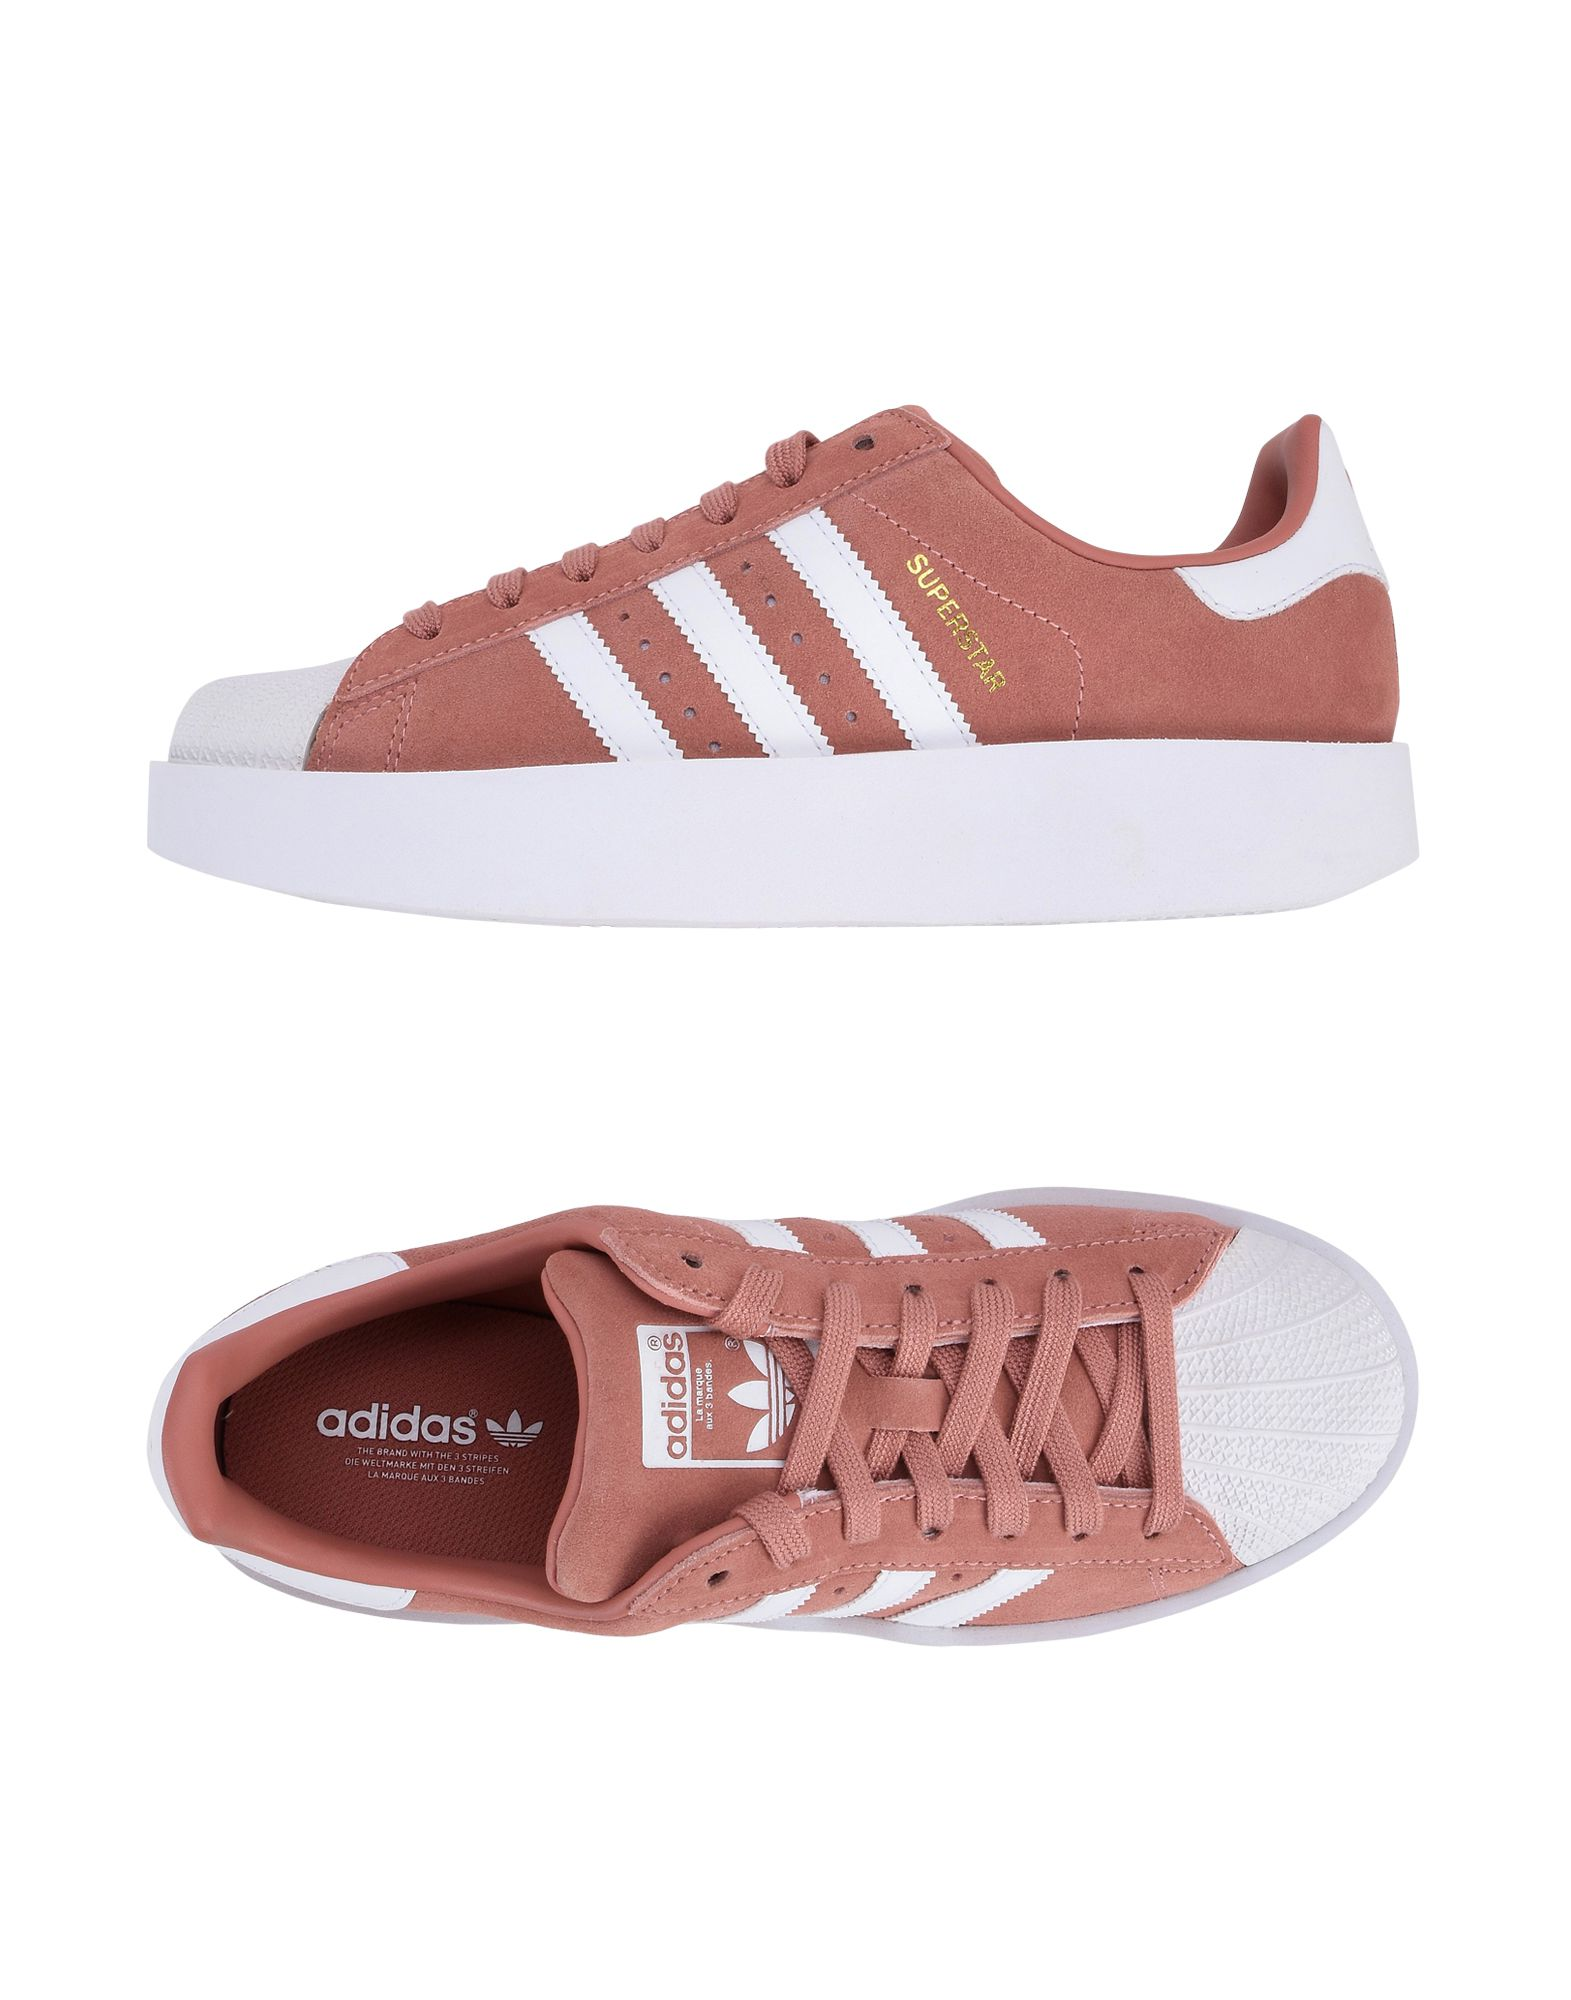 Adidas Originals Superstar Bold Women W - Sneakers - Women Bold Adidas Originals Sneakers online on  United Kingdom - 11431996JJ bc1de3